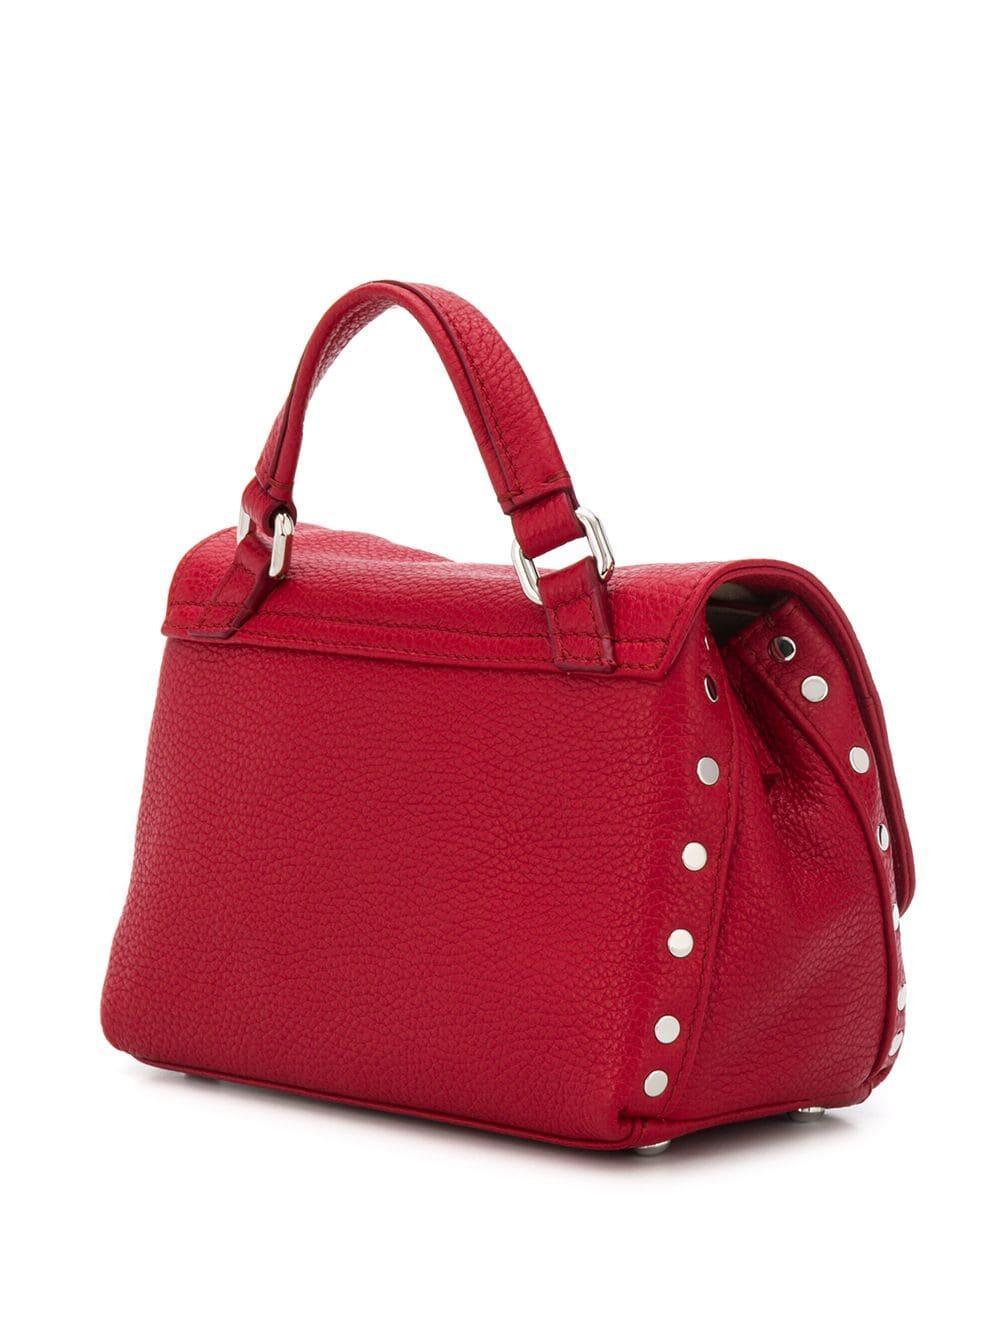 Zanellato Leder Mini 'Postina' Handtasche in Rot FT5yh